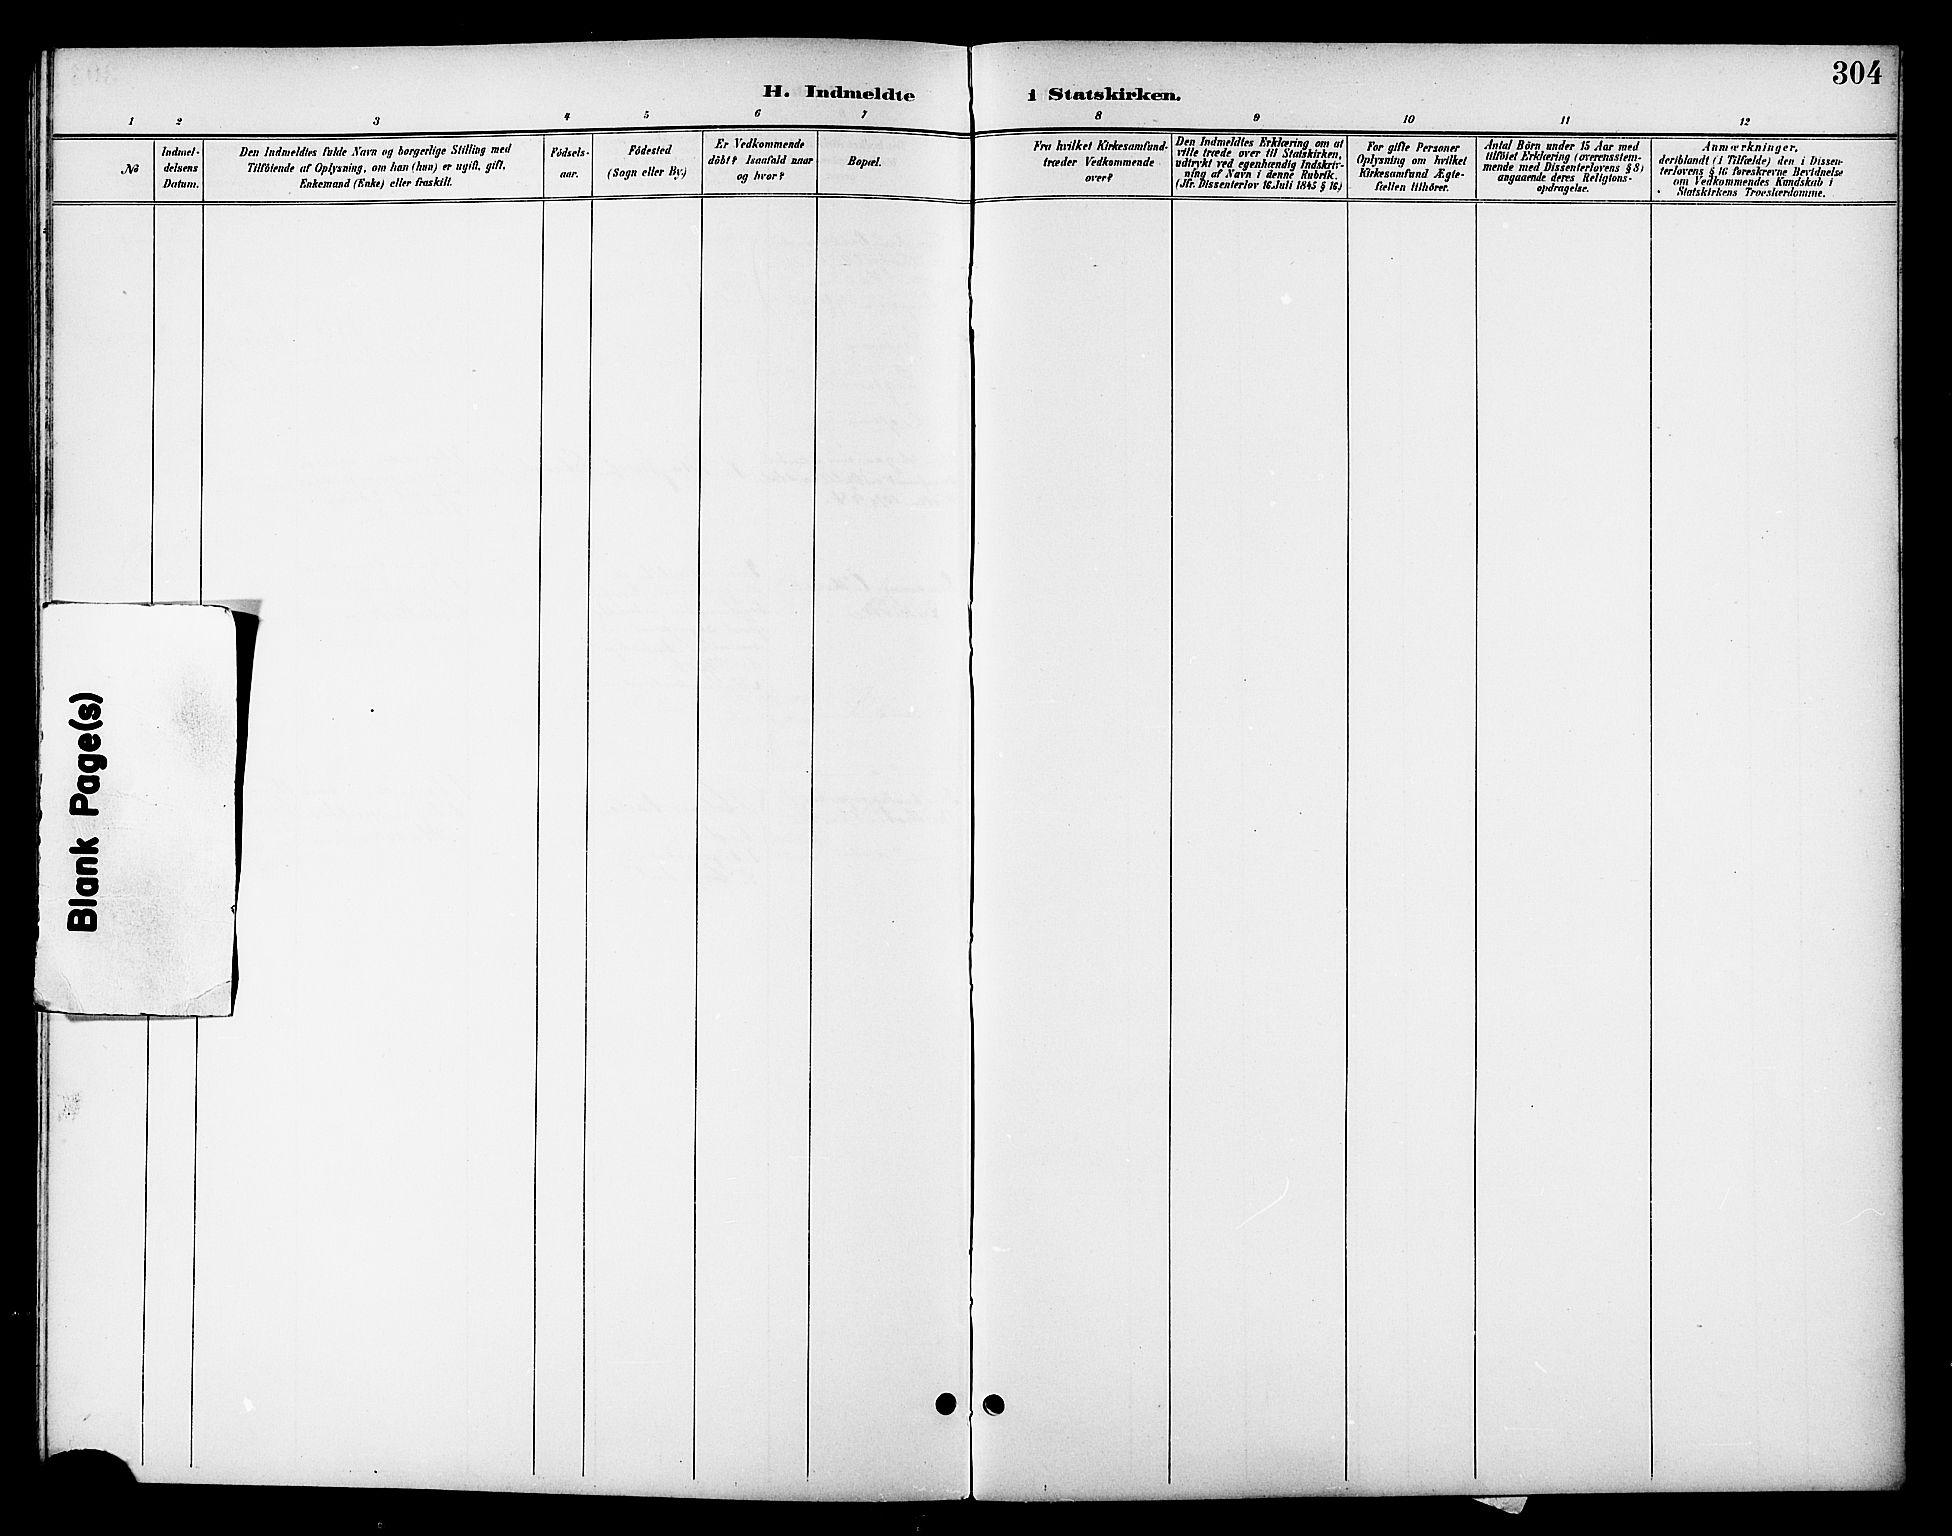 SAT, Ministerialprotokoller, klokkerbøker og fødselsregistre - Nordland, 801/L0033: Klokkerbok nr. 801C08, 1898-1910, s. 304